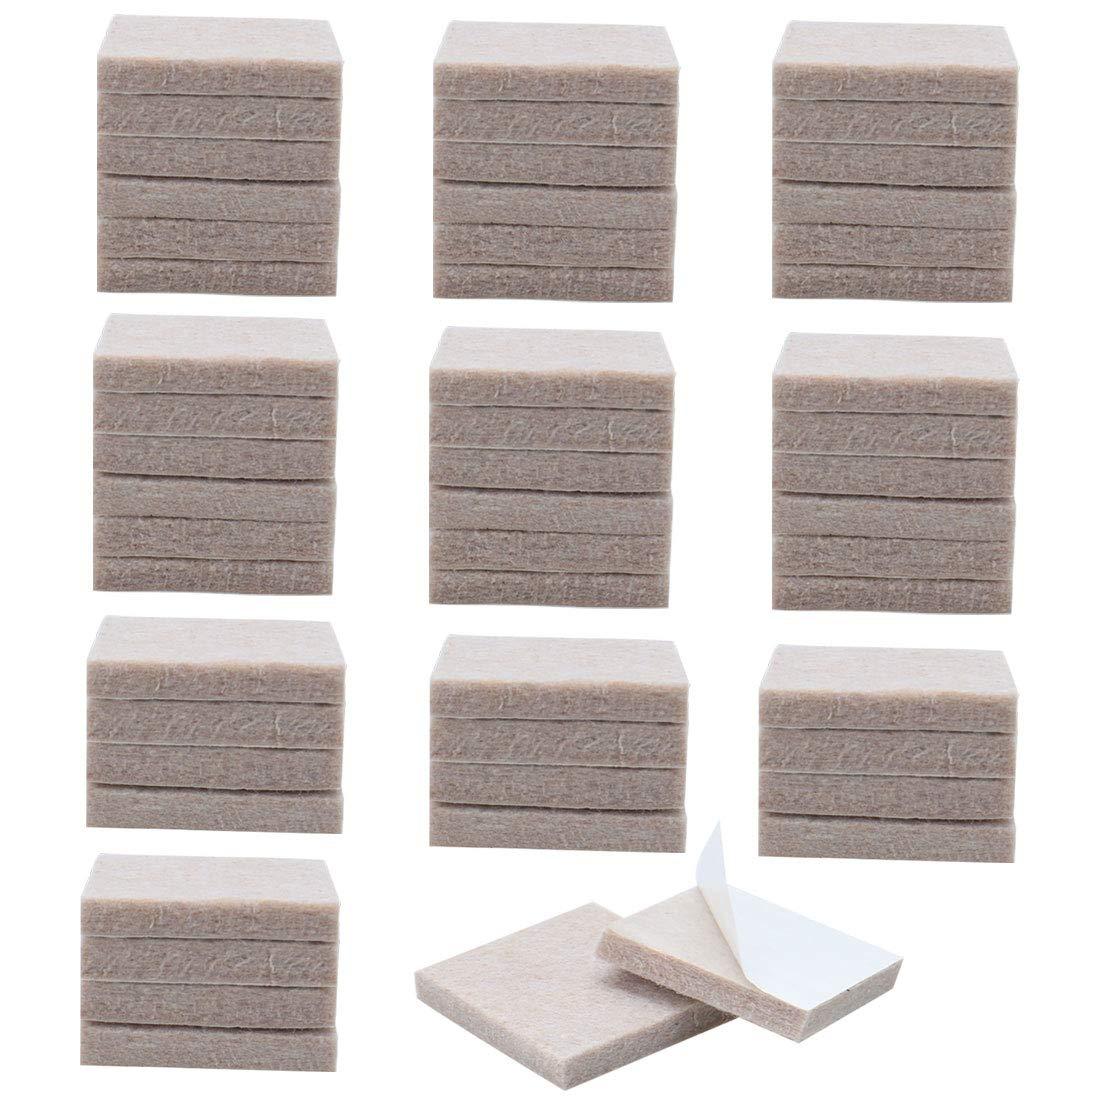 uxcell 100pcs Furniture Pads Round 7/8' Self-stick Non-slip Anti-scratch Felt Pads Cabinet Floors Protector Beige